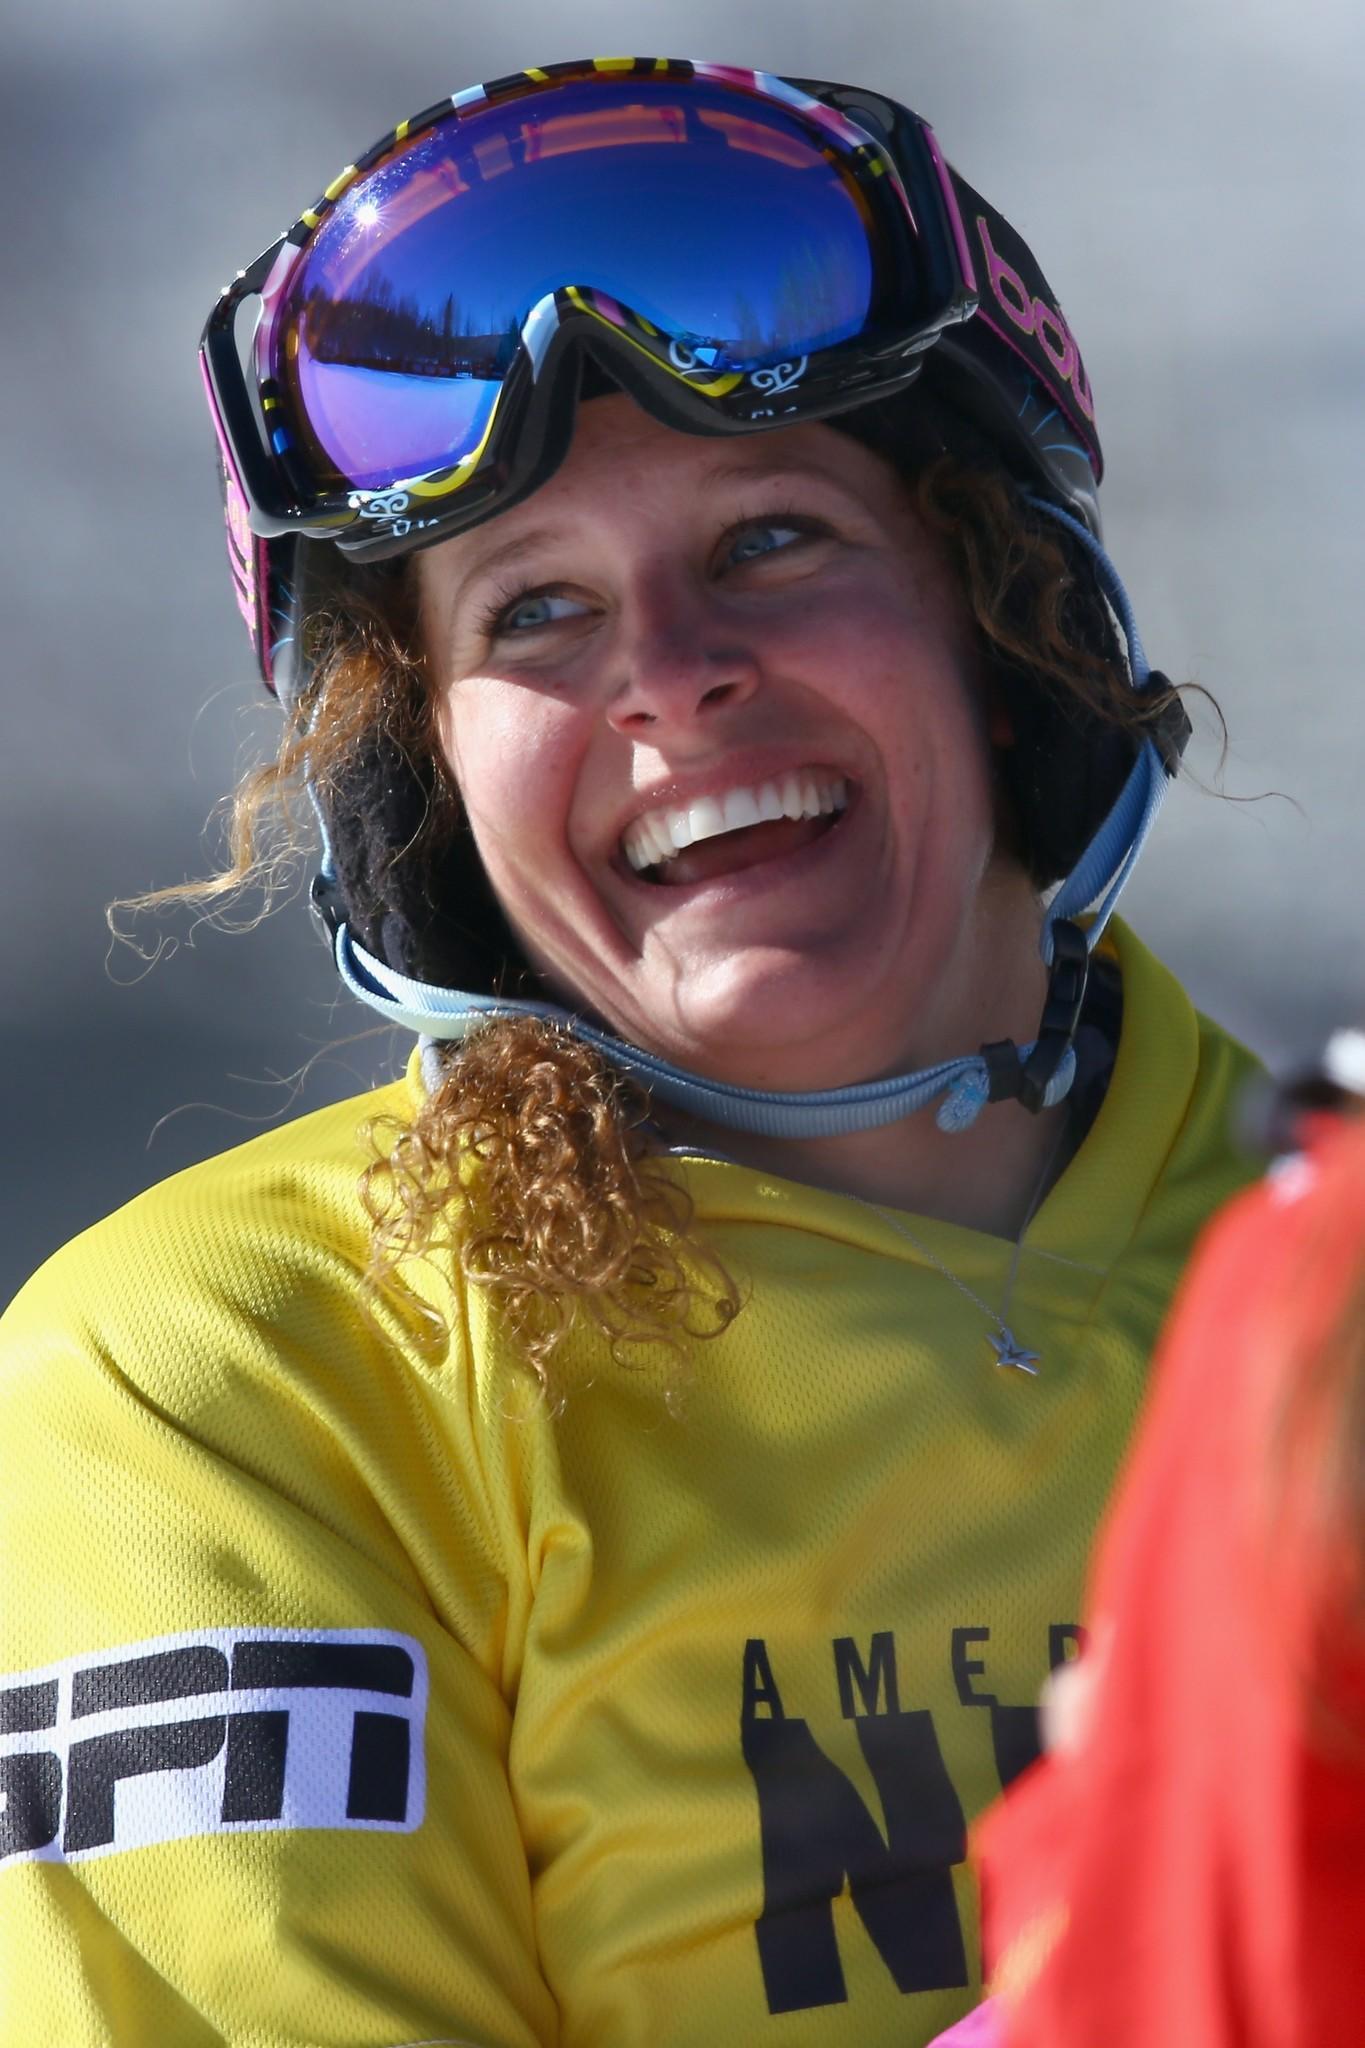 Lindsey Jacobellis celebrates after winning the women's Snowboarder X final during Winter X-Games 2014 Aspen at Buttermilk Mountain. (Doug Pensinger/Getty Photo)